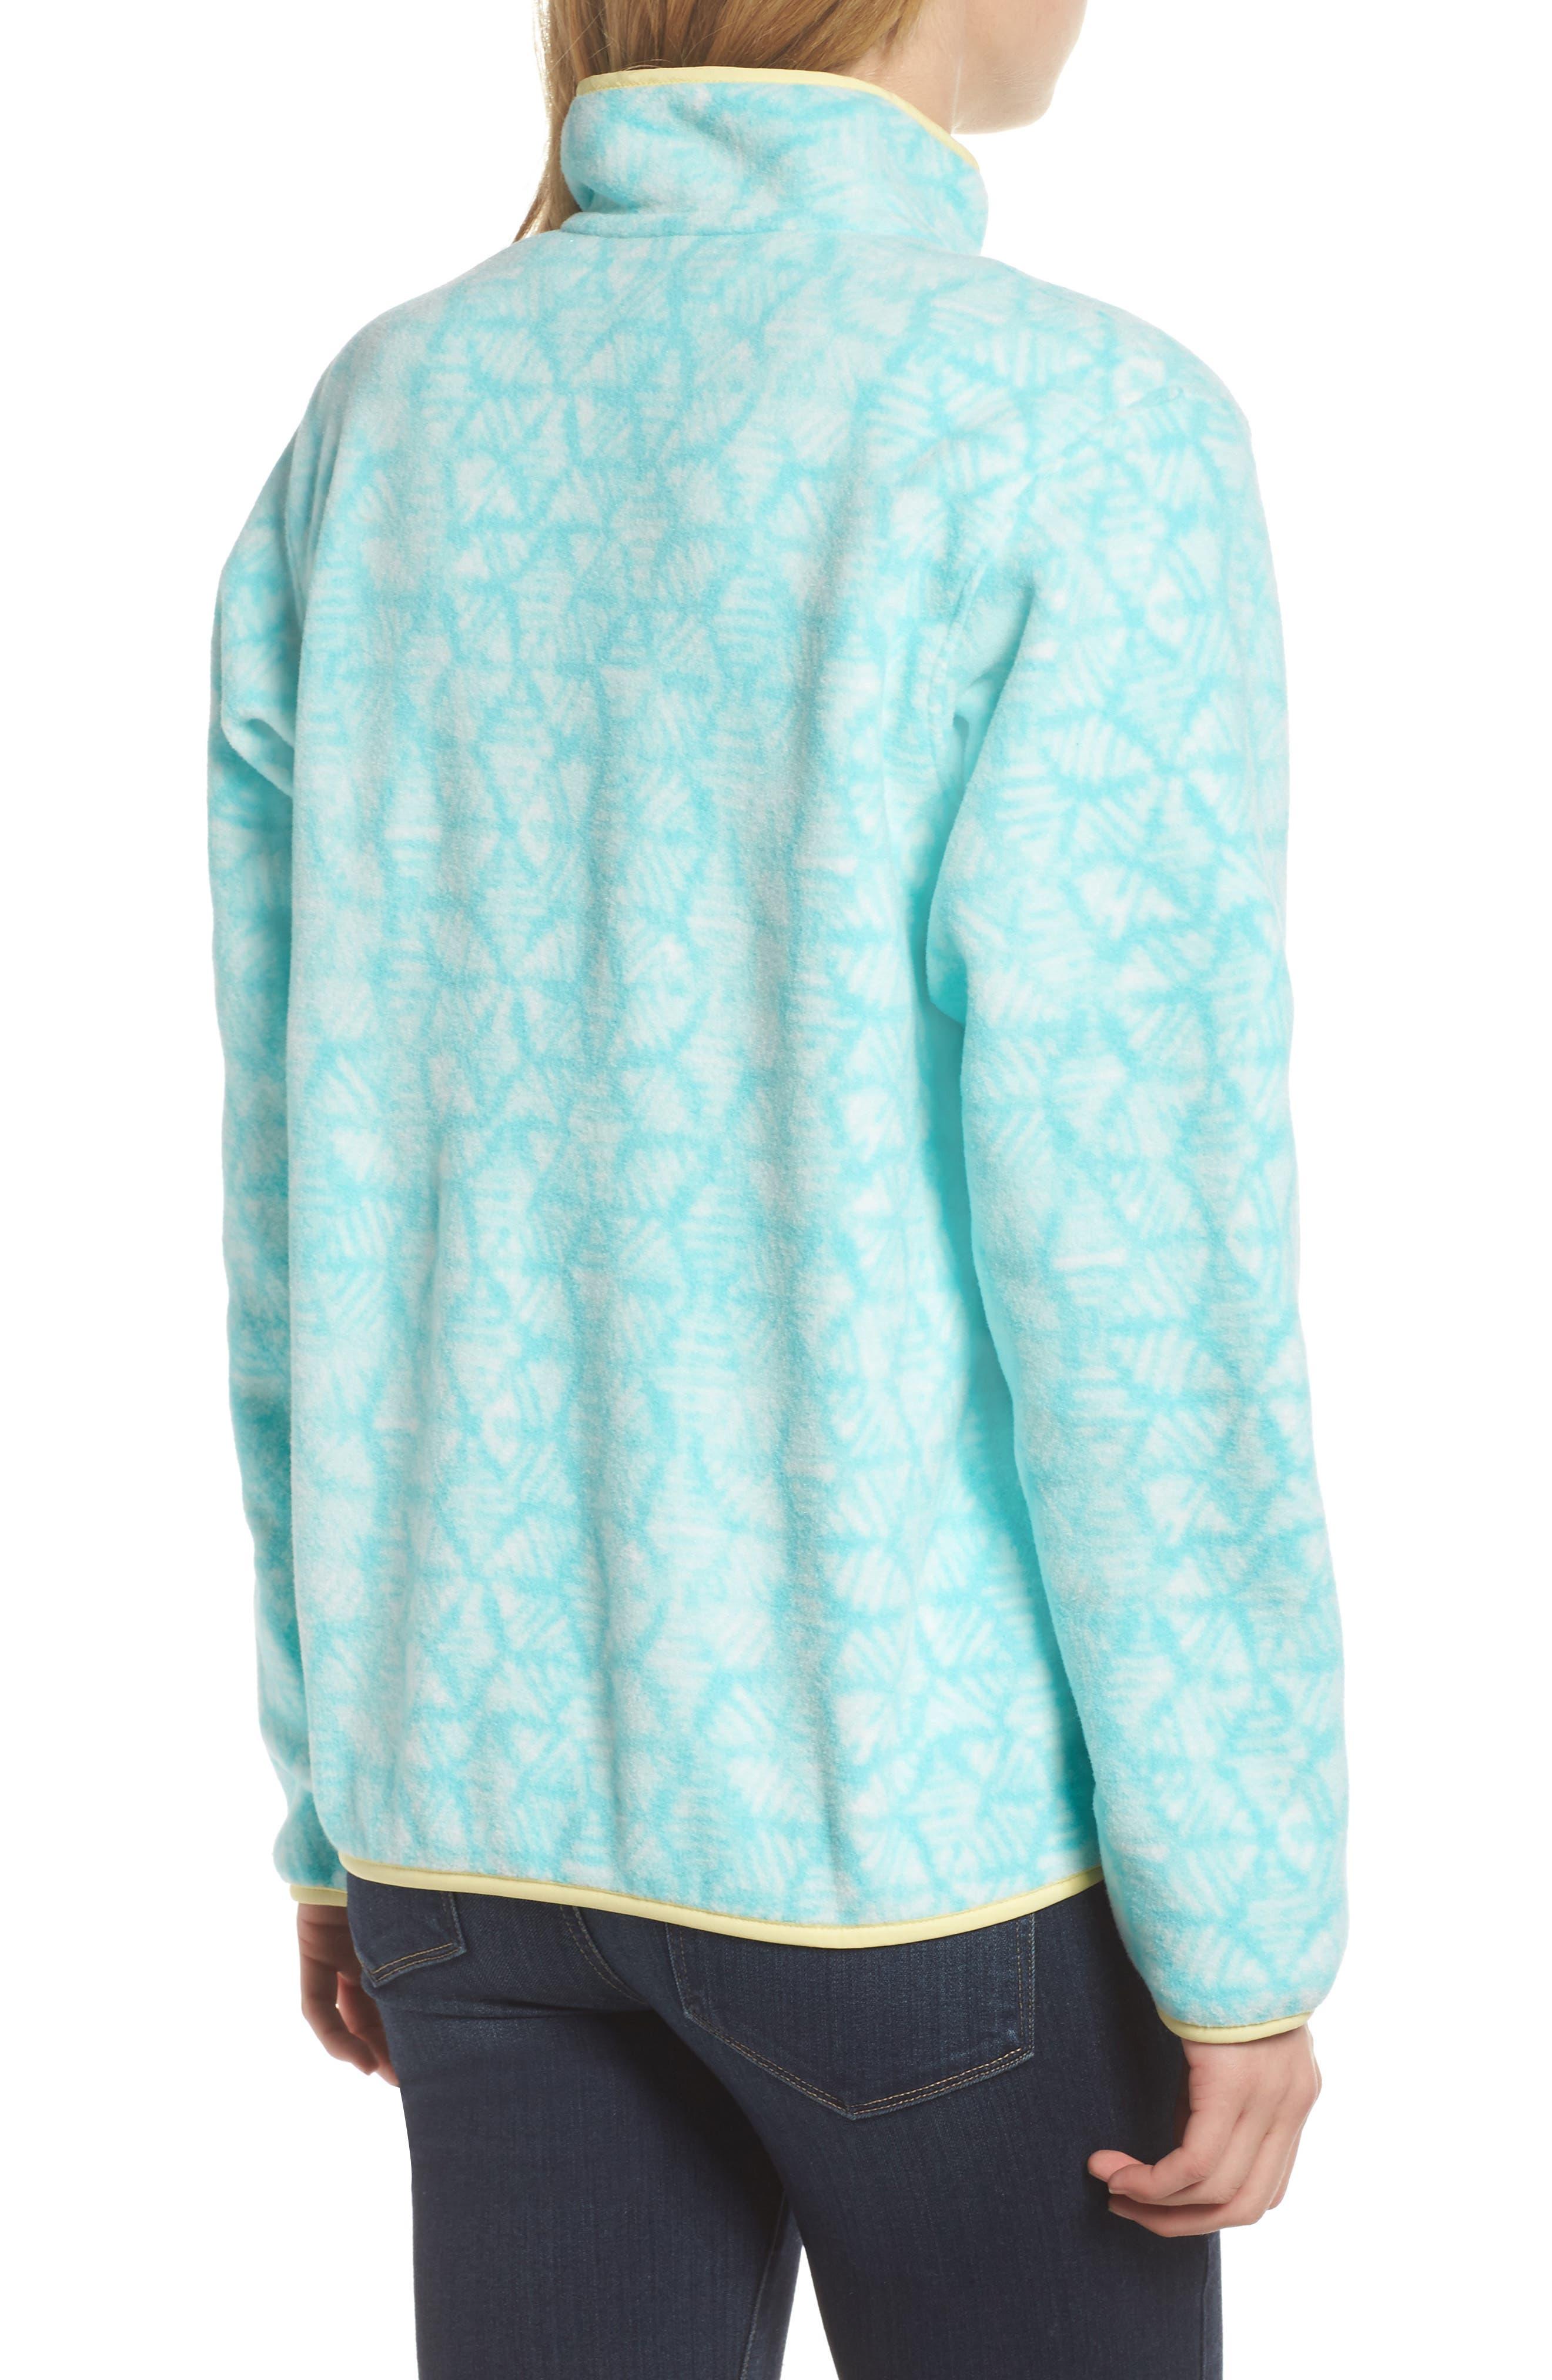 Synchilla Snap-T<sup>®</sup> Fleece Pullover,                             Alternate thumbnail 2, color,                             Batik Hex Big/ Bend Blue